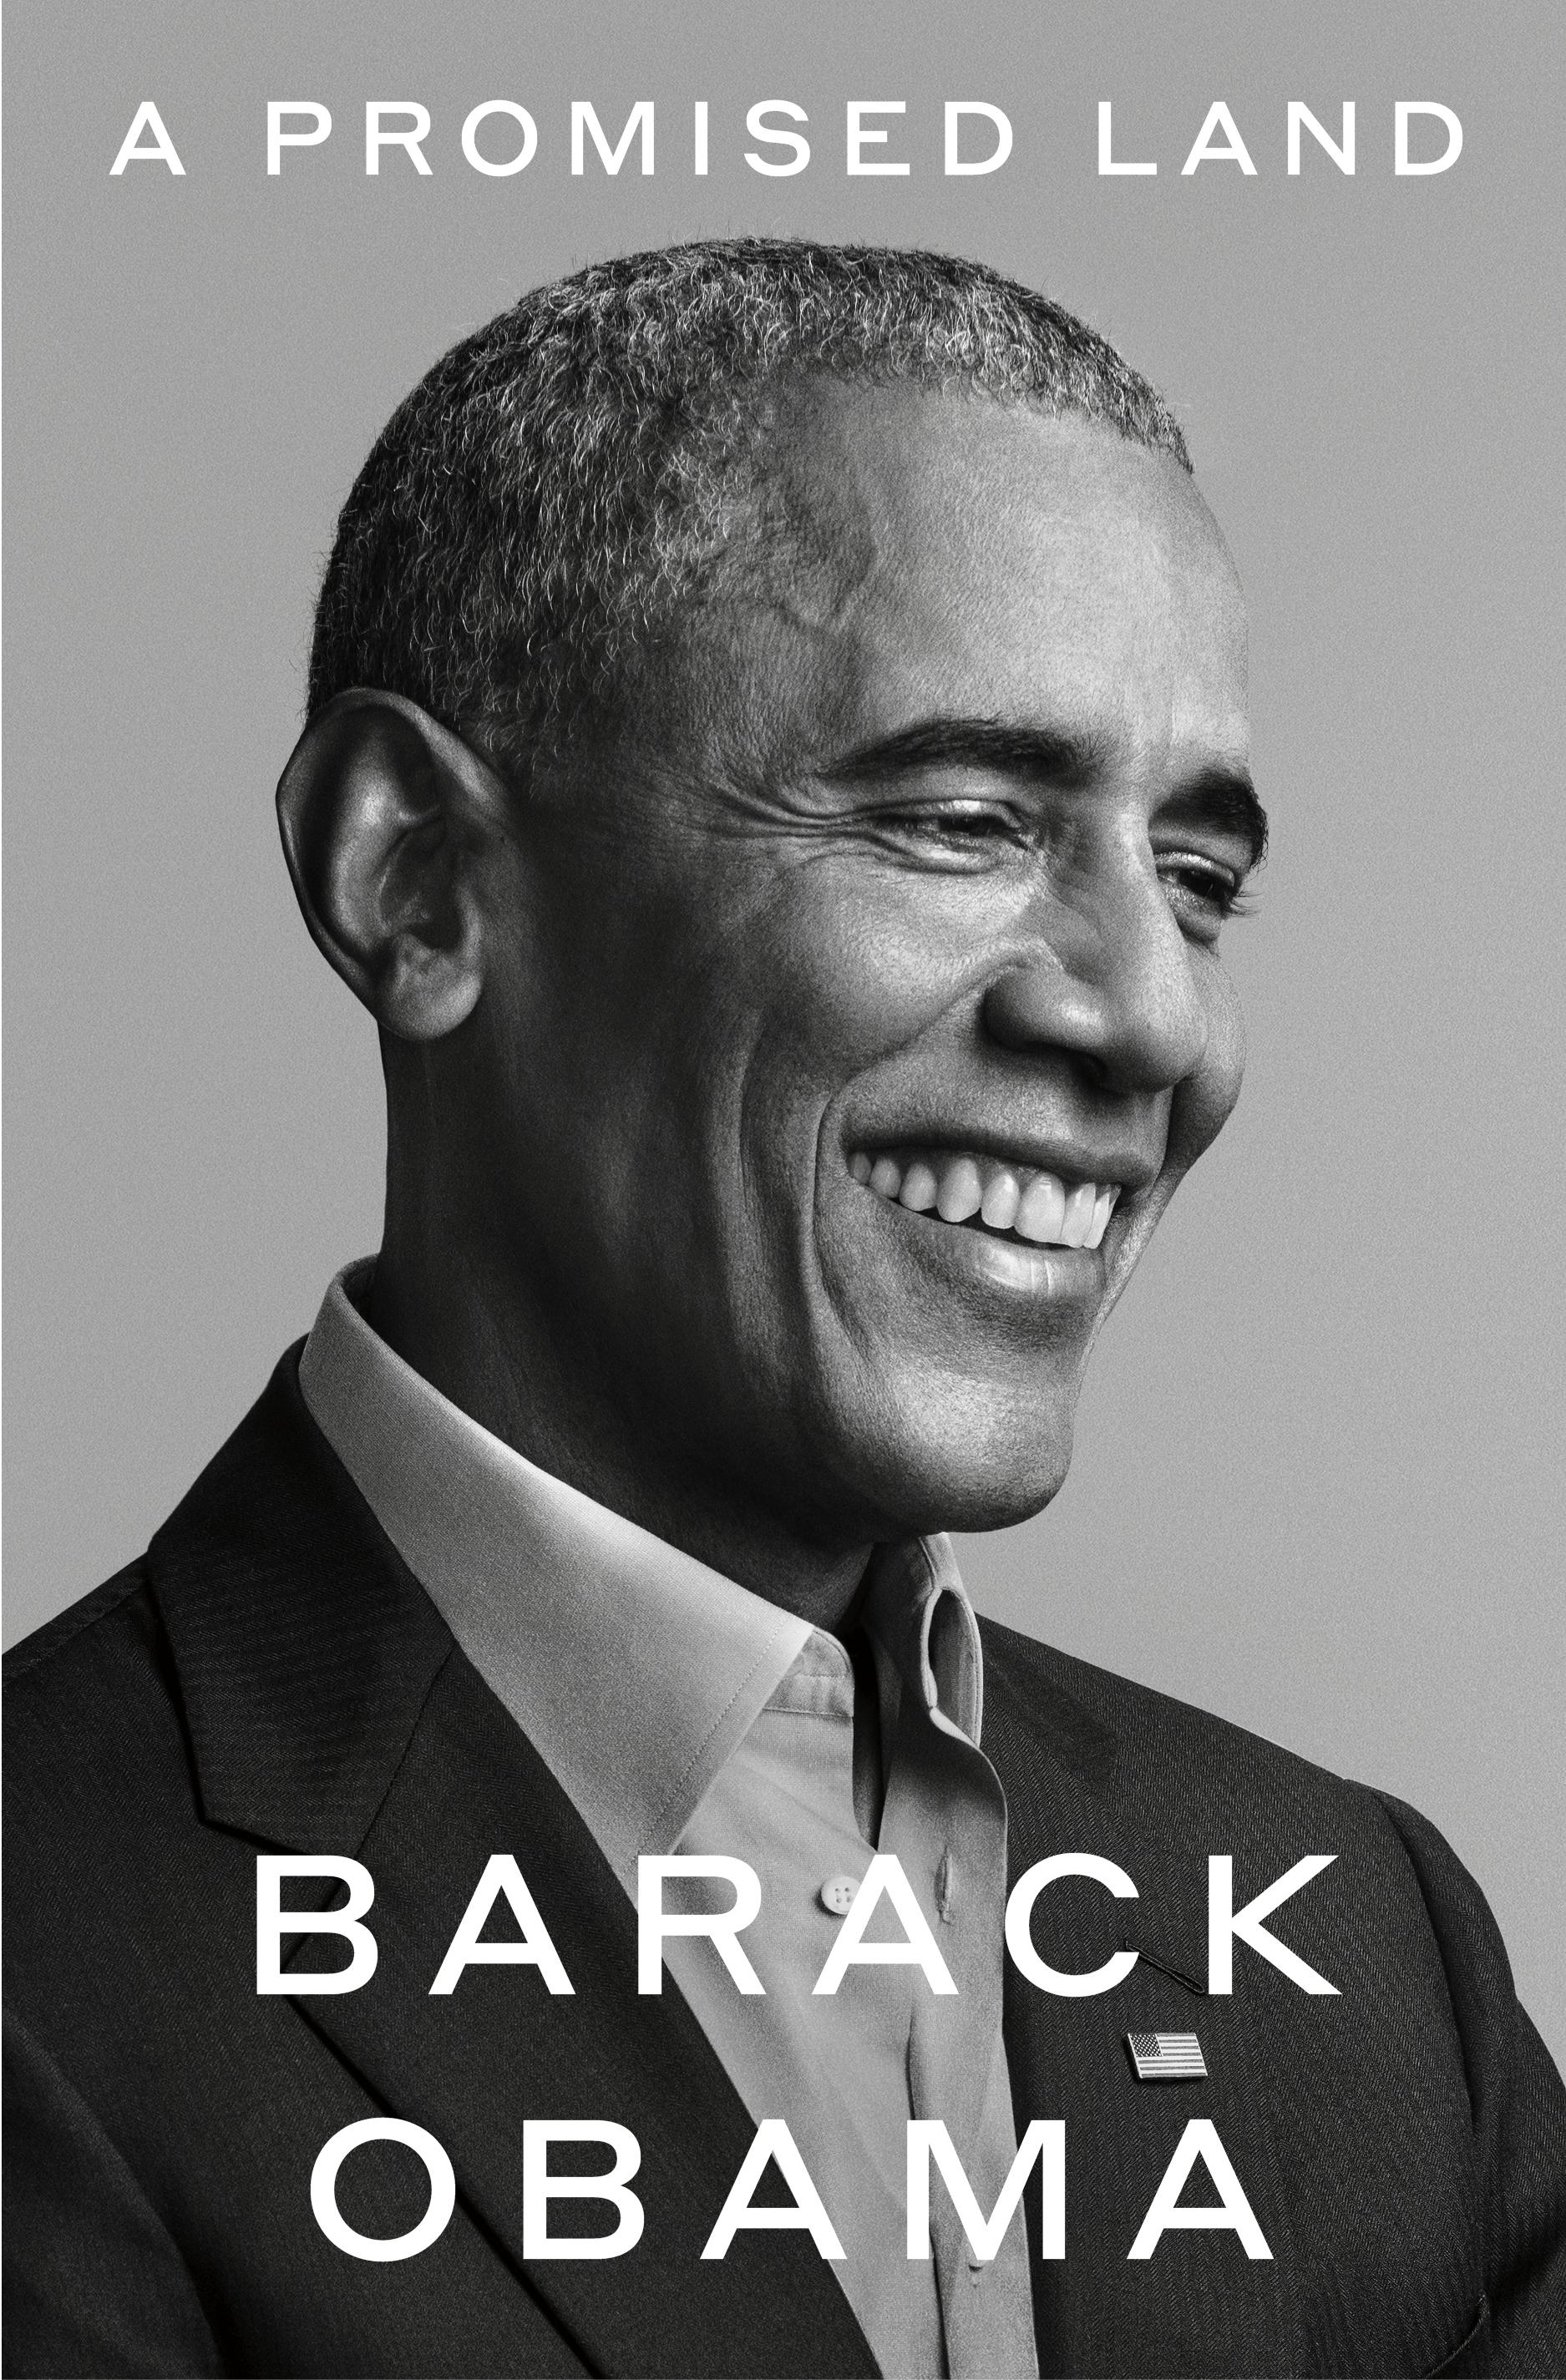 barack obama, a promised land memoir cover